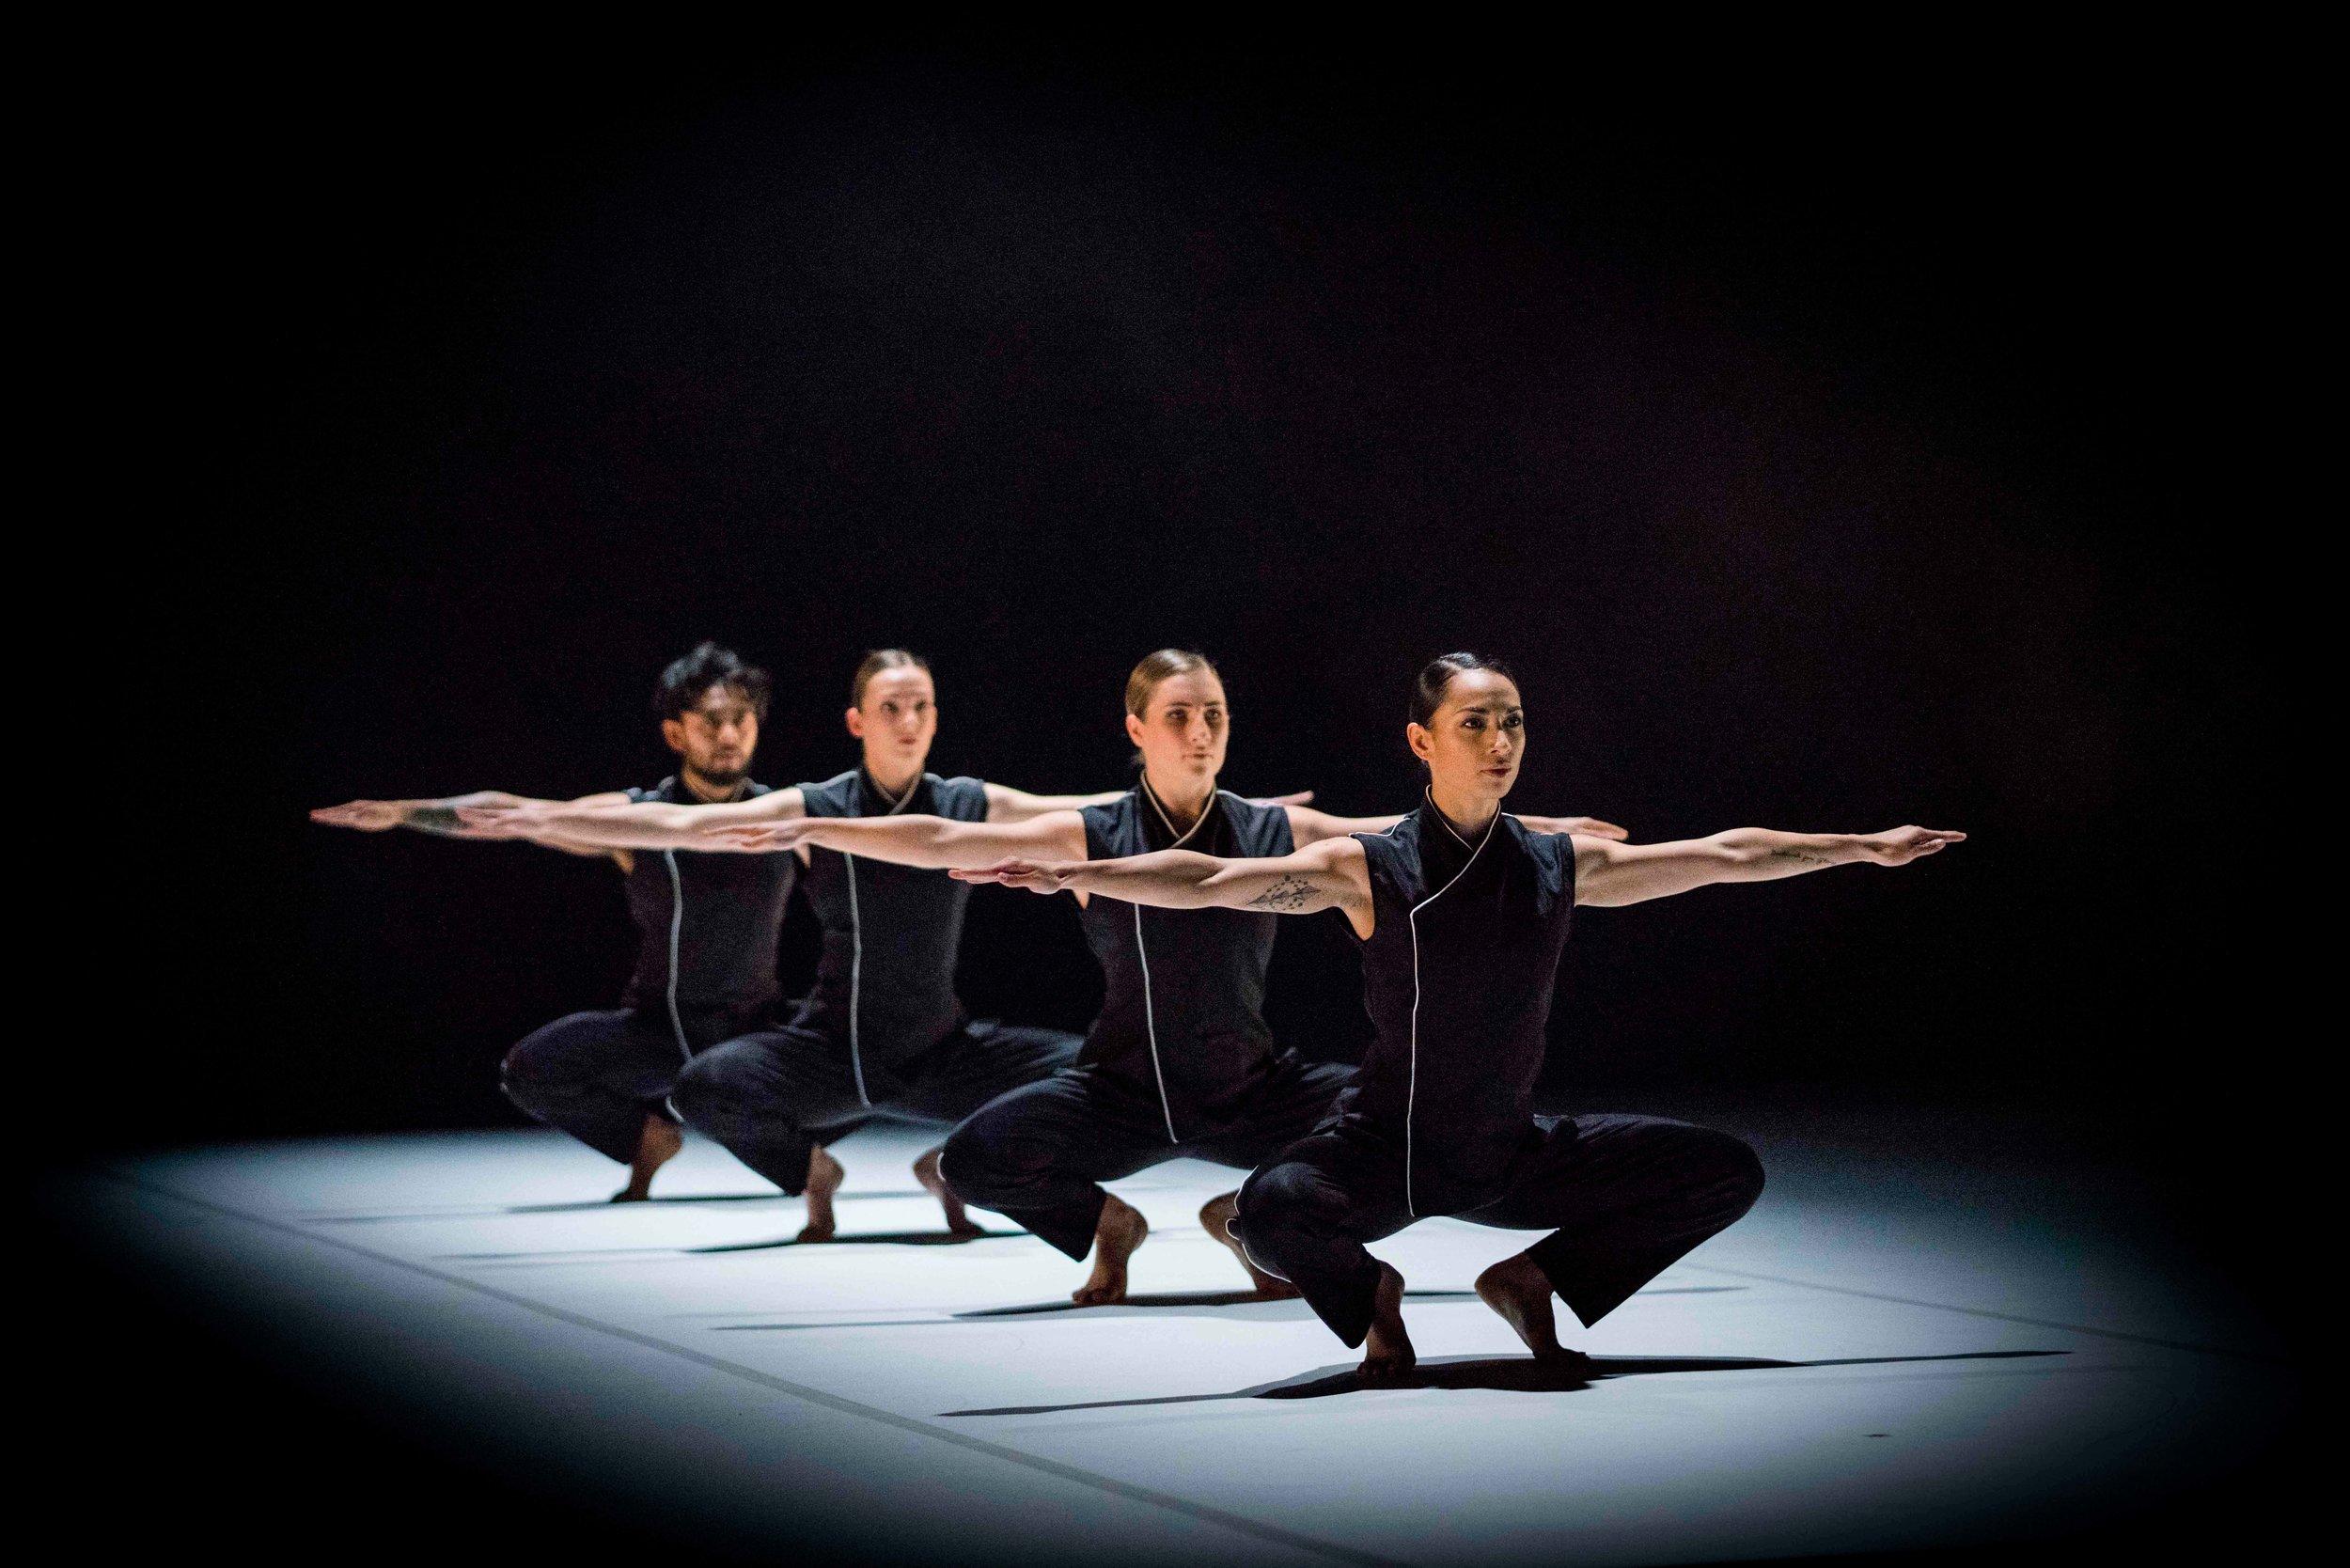 The New Zealand Dance Company performs 'Sigan' by Jae Duk Kim. Photo by John McDermott